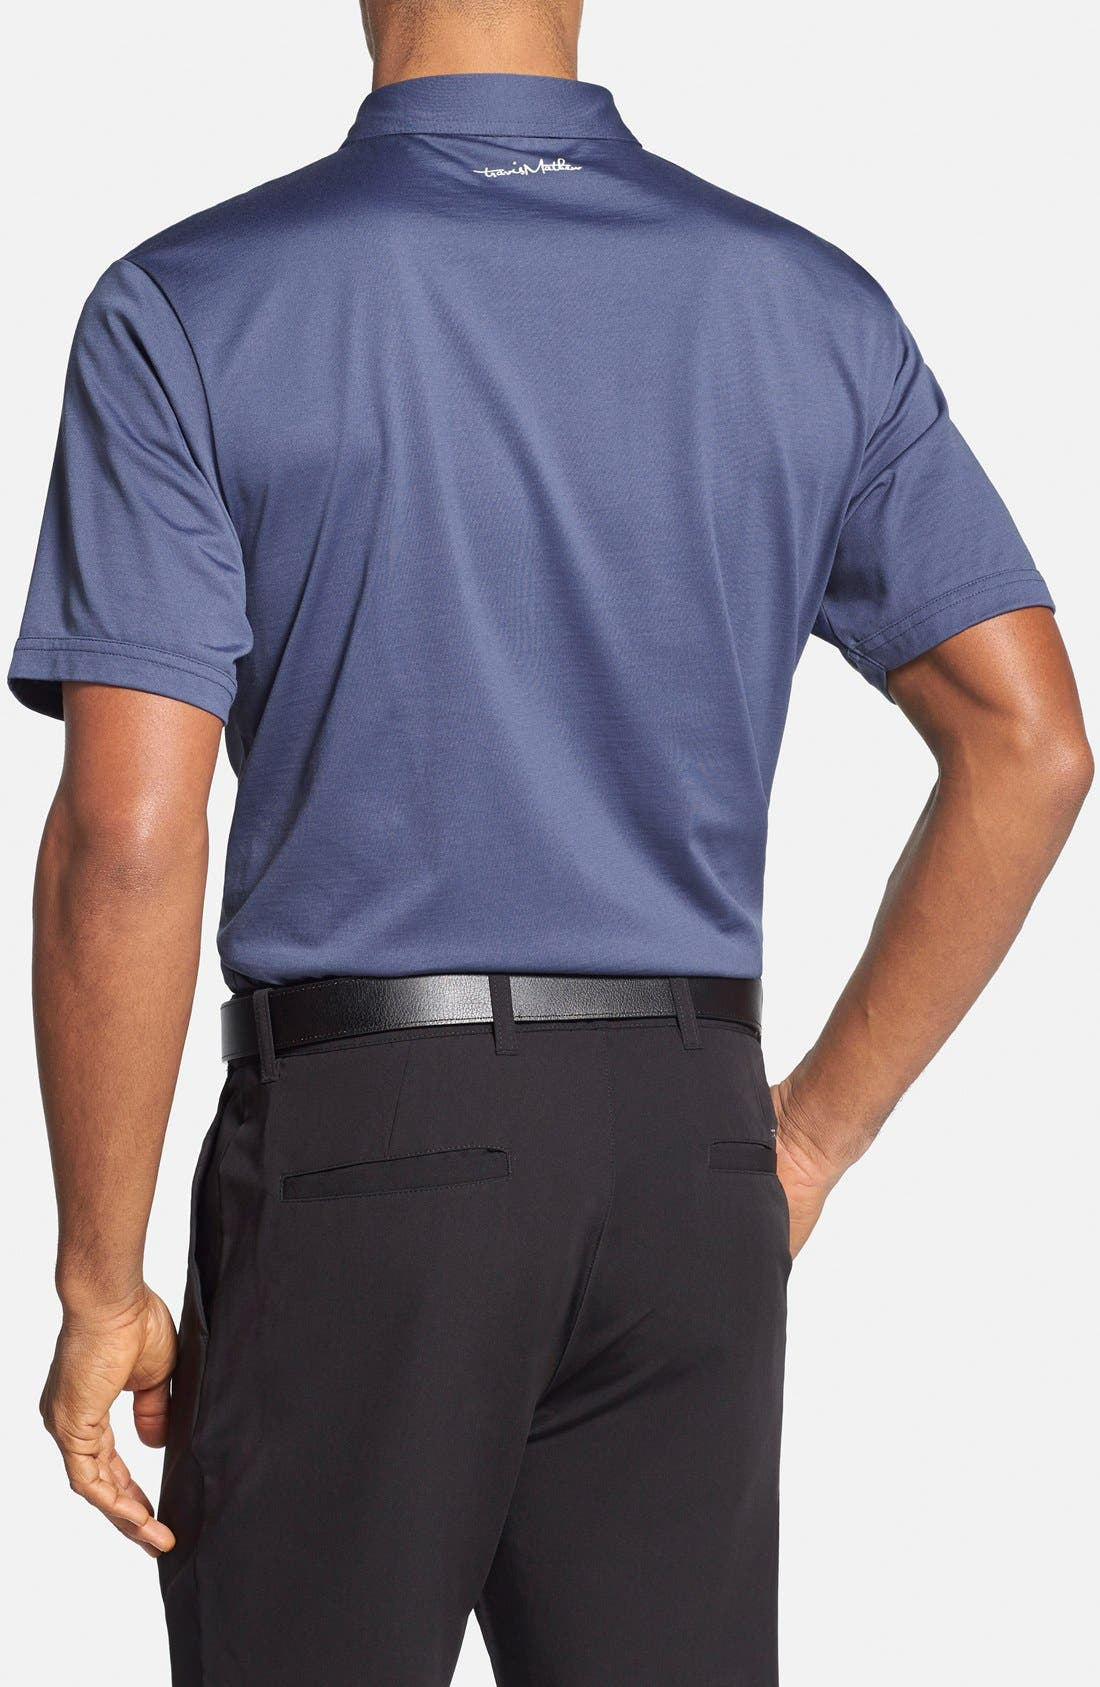 Alternate Image 2  - Travis Mathew 'OG' Trim Fit Performance Golf Polo